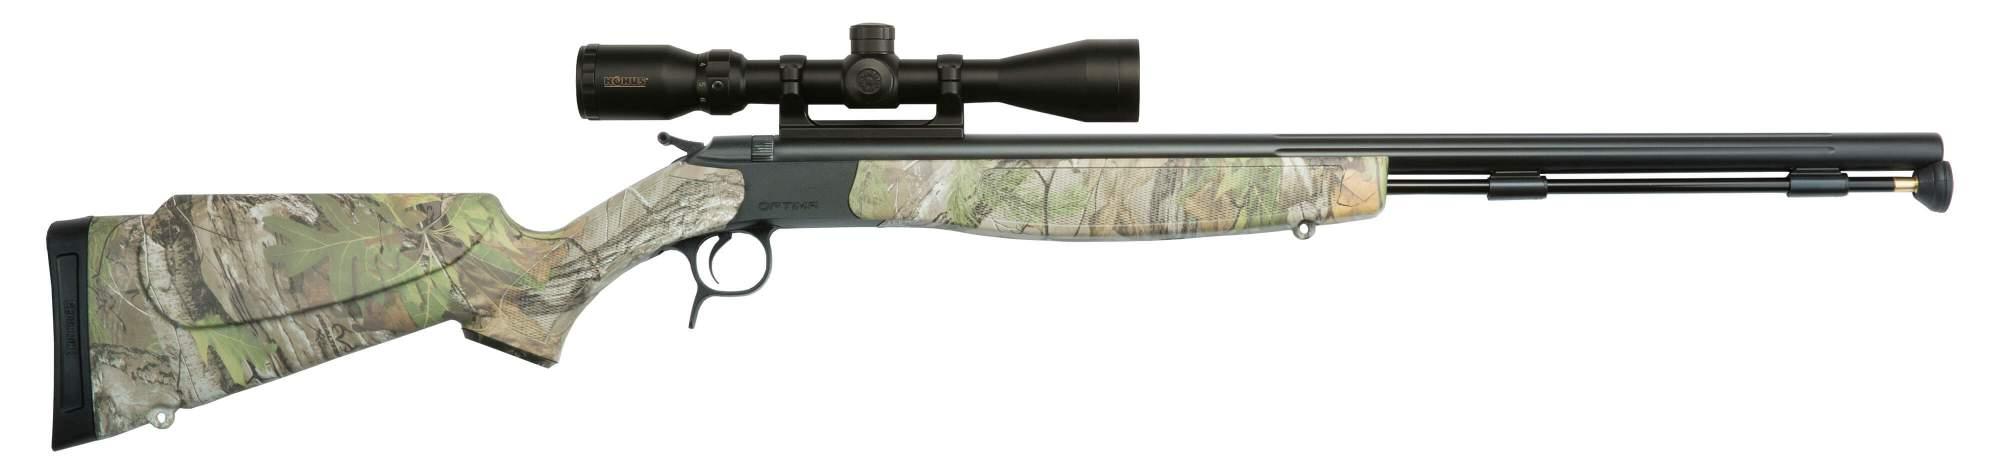 hight resolution of optima rifles cva cva optima trigger assembly cva optima schematic diagram